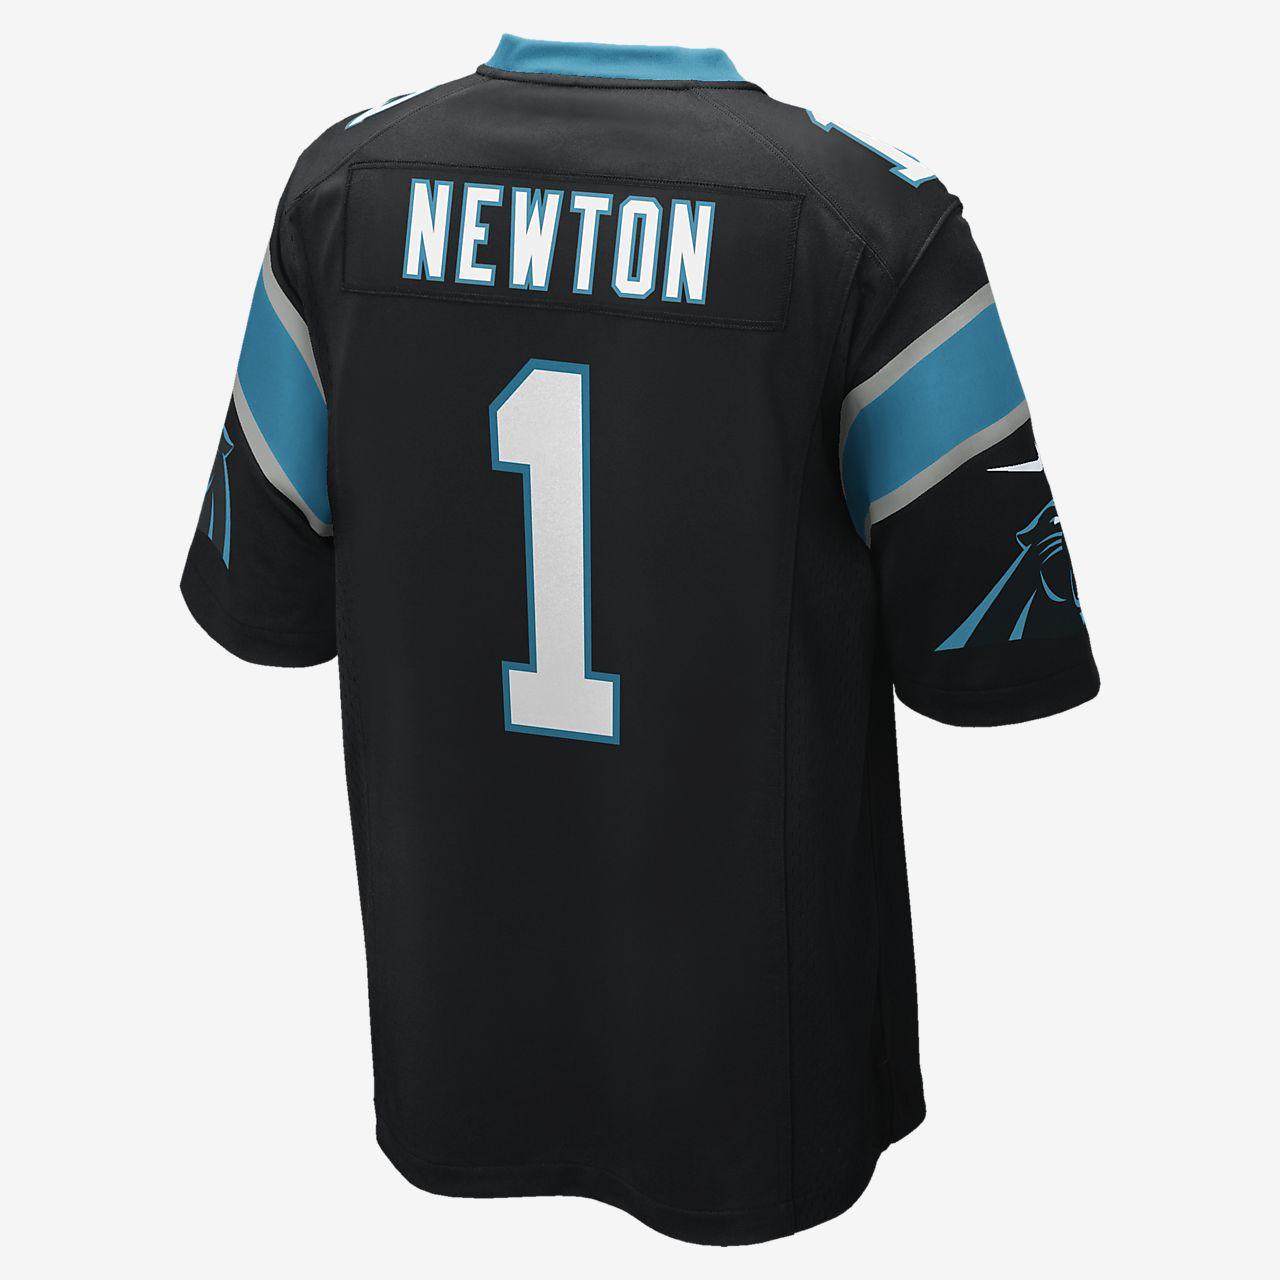 7ffa7942b ... NFL Carolina Panthers (Cam Newton) Men's Football Home Game Jersey